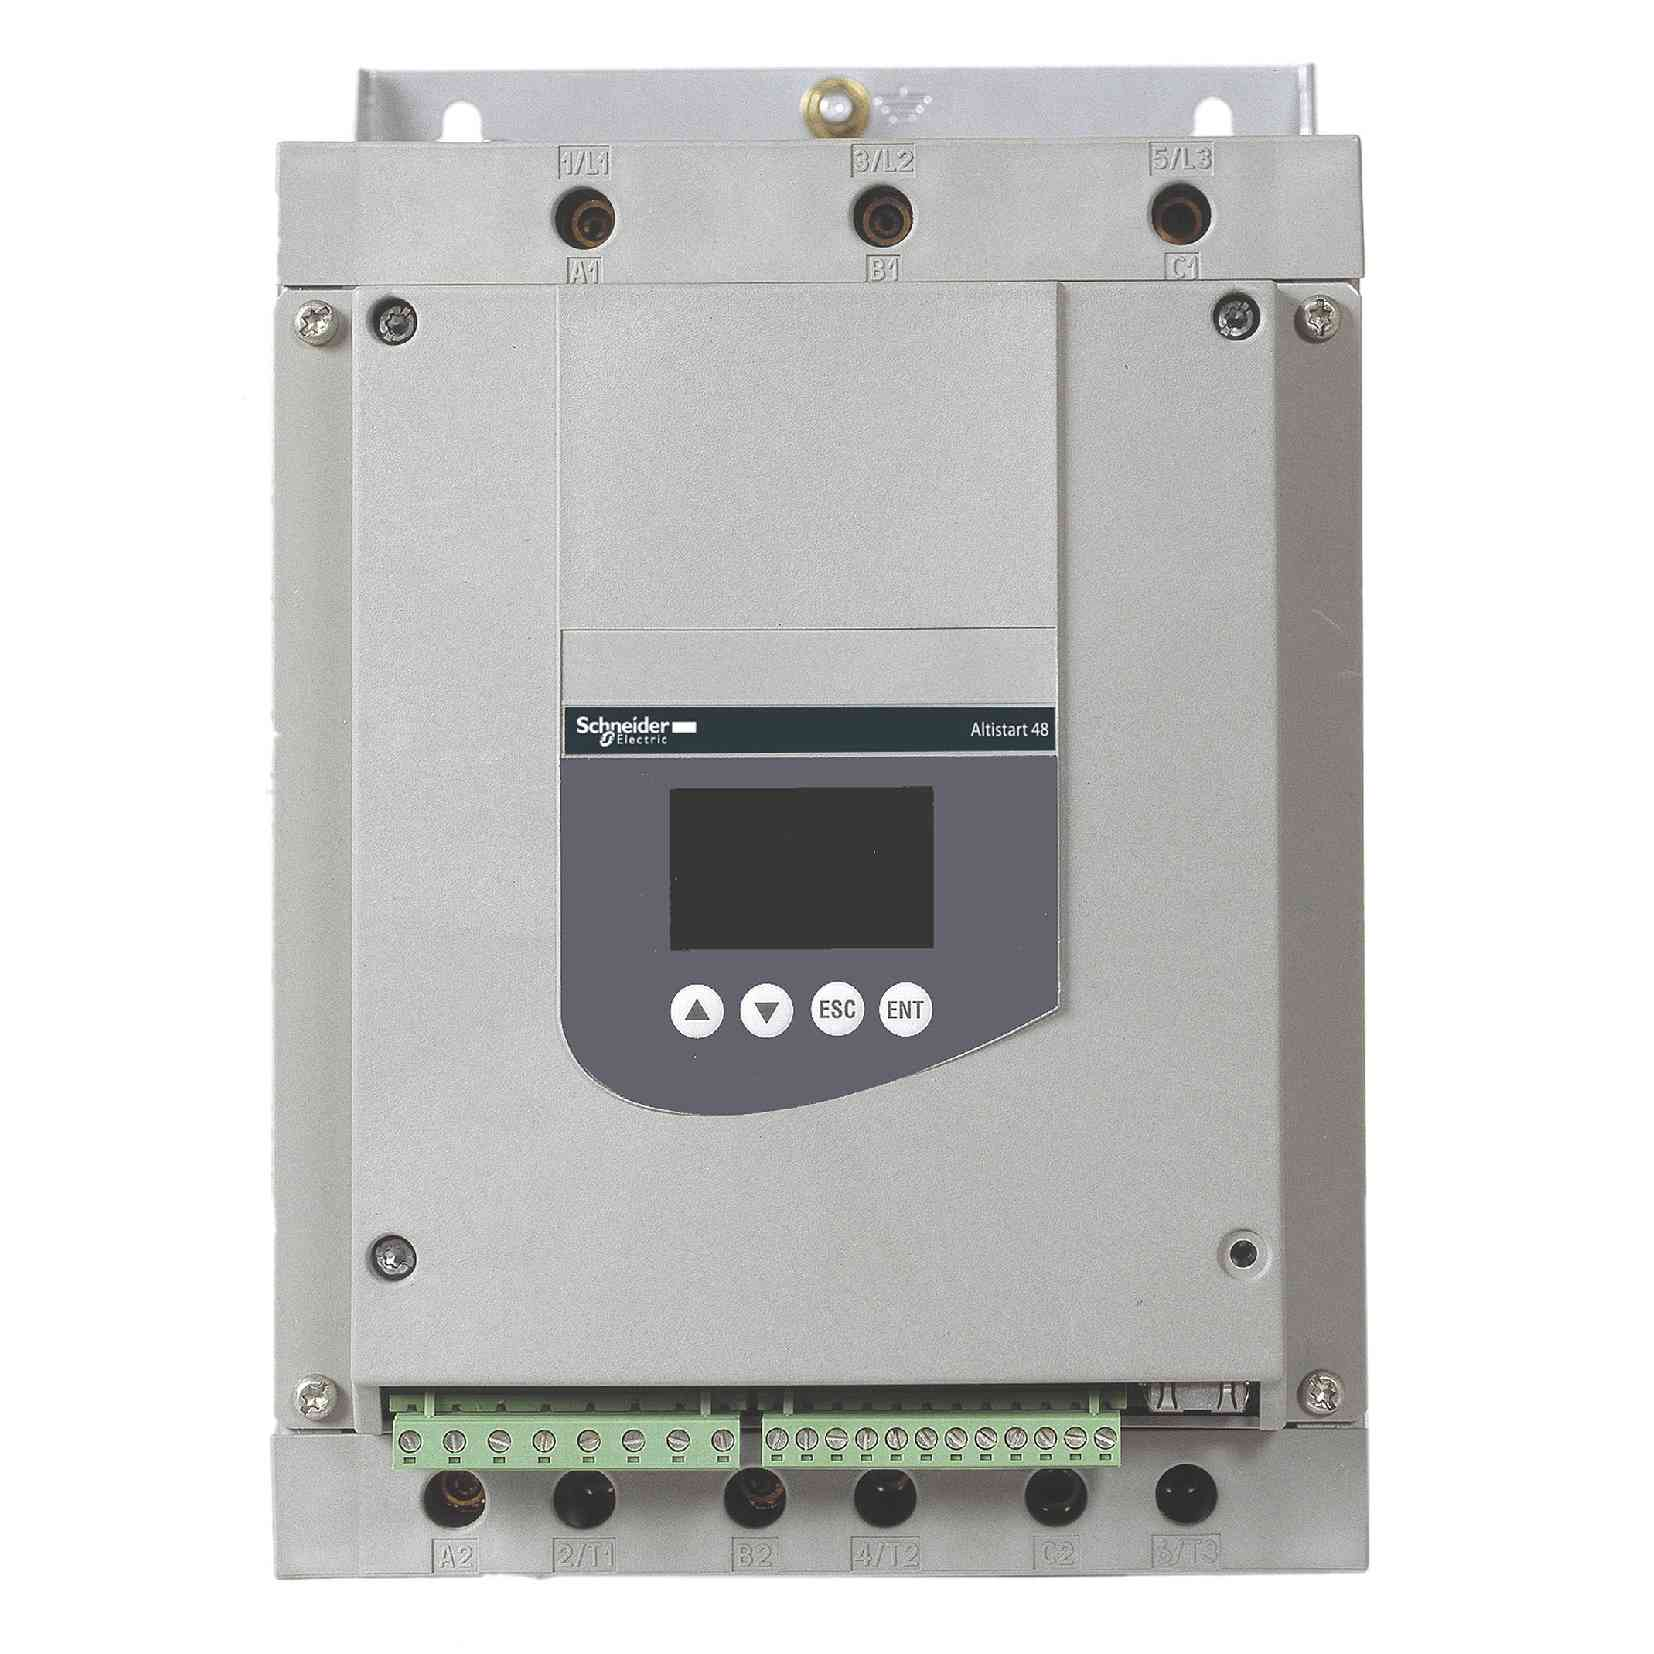 Mehki zaganjalnik za asinhroni motor - ATS48 - 65 A - 208 do 690 V - 15 do 55 KW